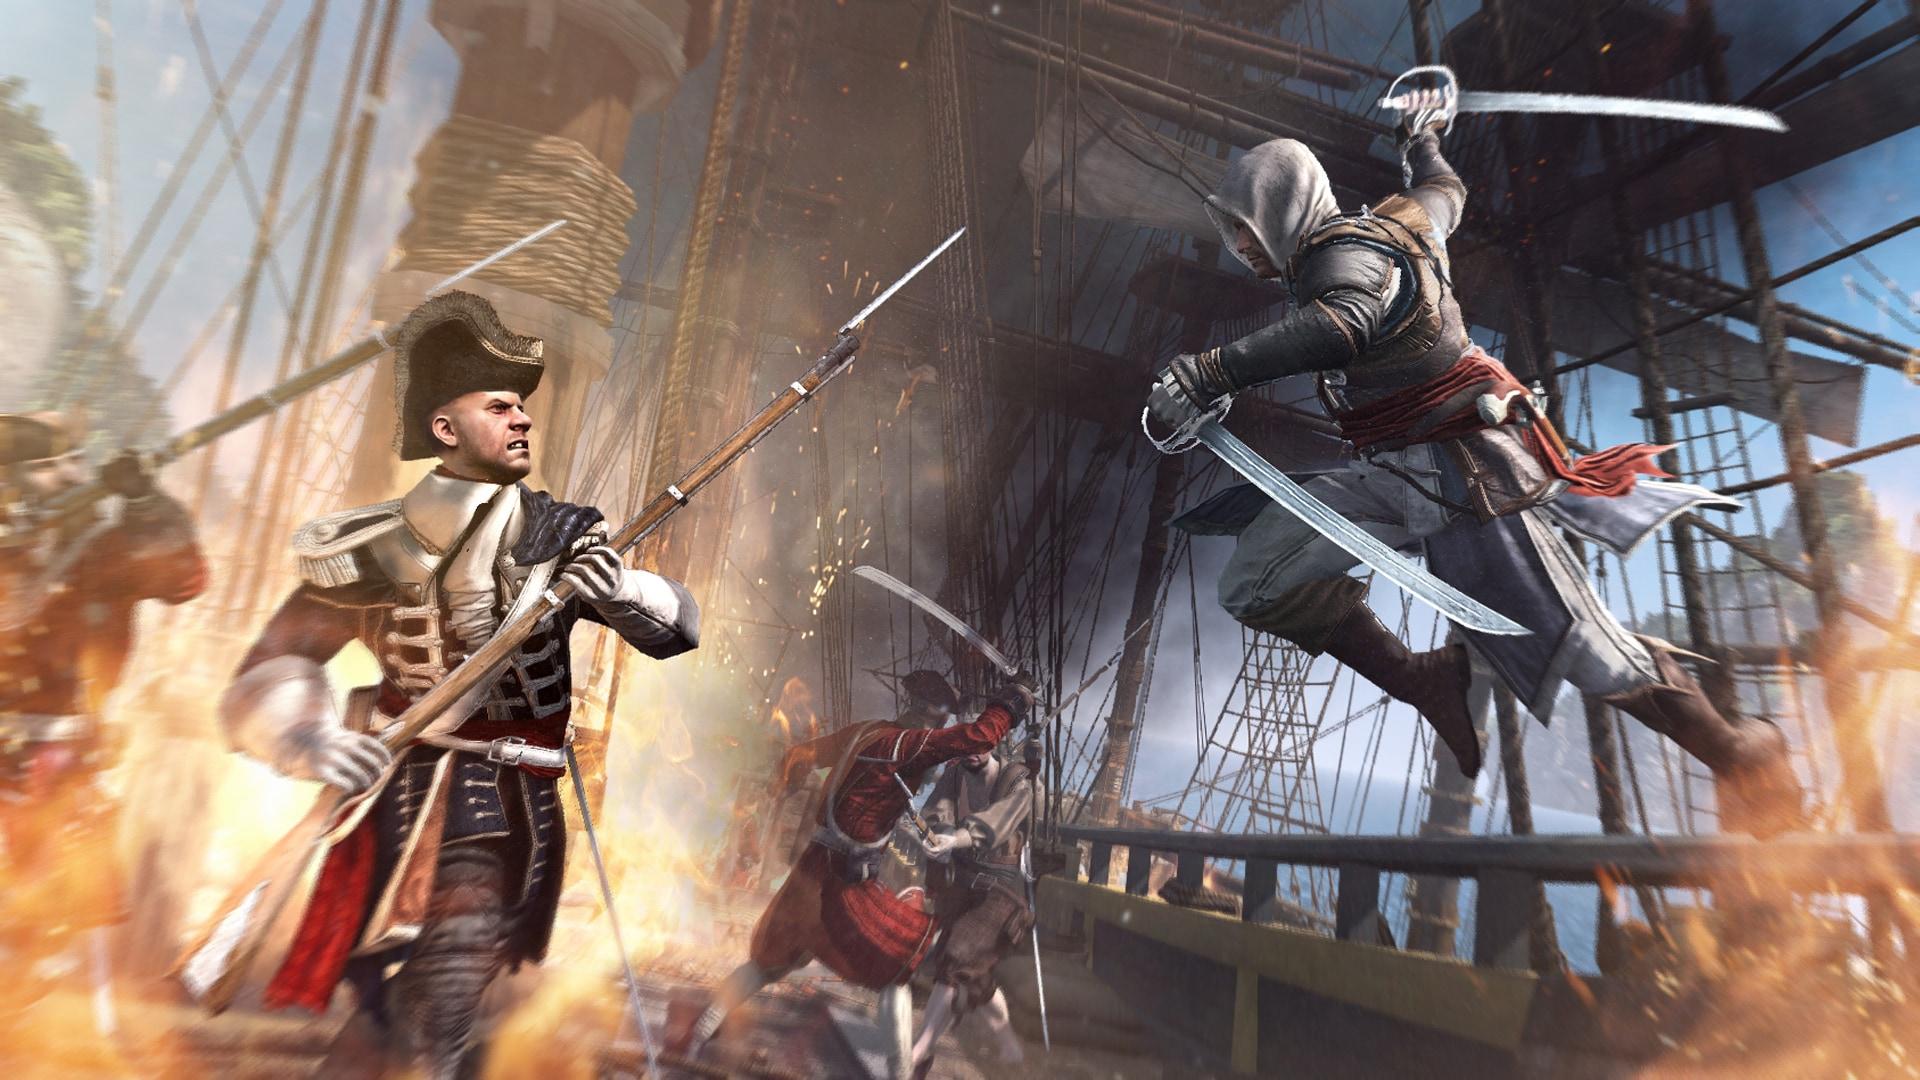 Assassin's Creed IV: Black Flag (PC) - Ubisoft Connect Key - GLOBAL - 4